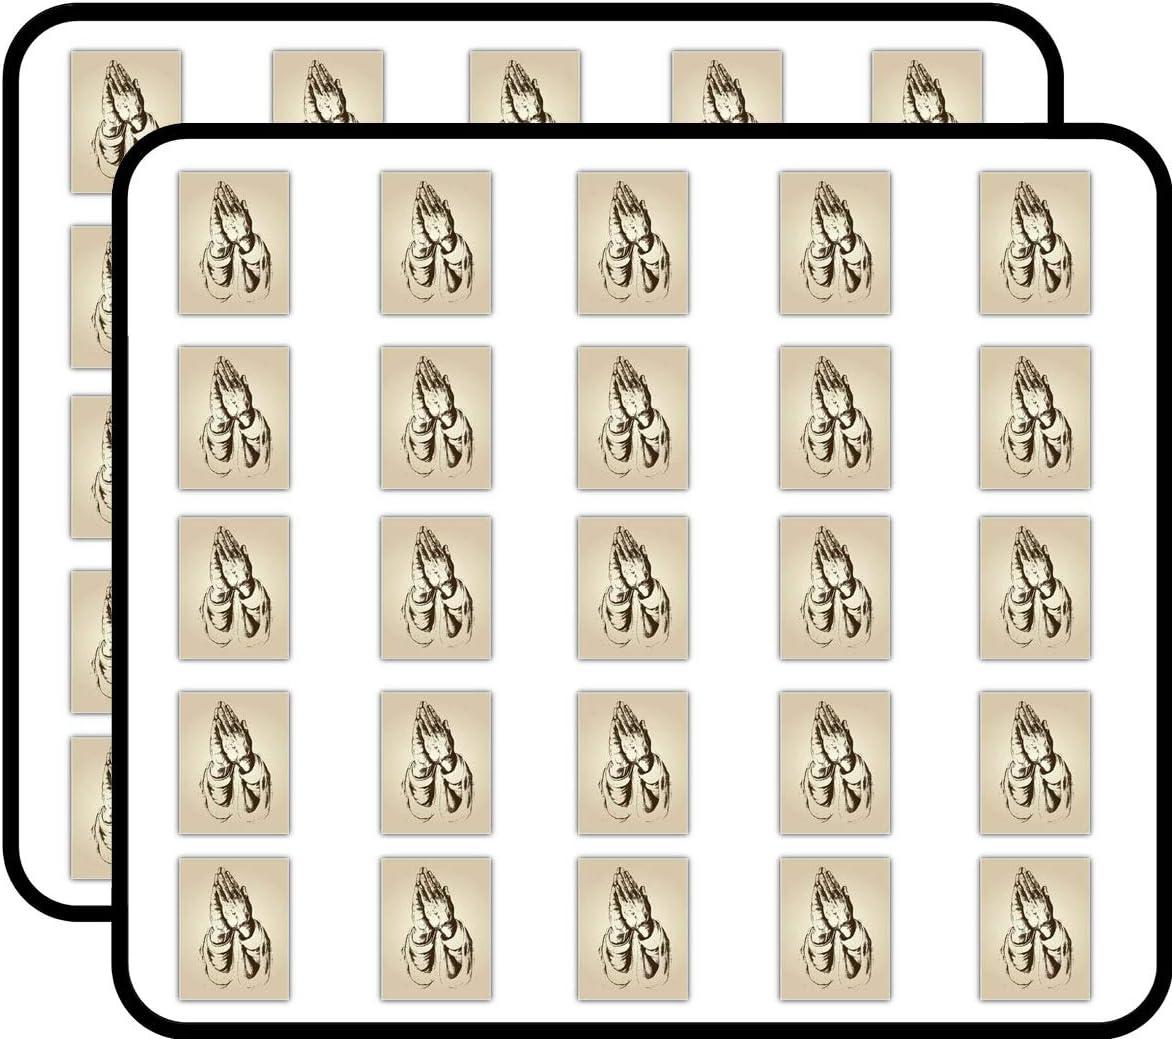 Praying Hands and Faith Religion Art Decor Sticker for Scrapbooking, Calendars, Arts, Kids DIY Crafts, Album, Bullet Journals 50 Pack